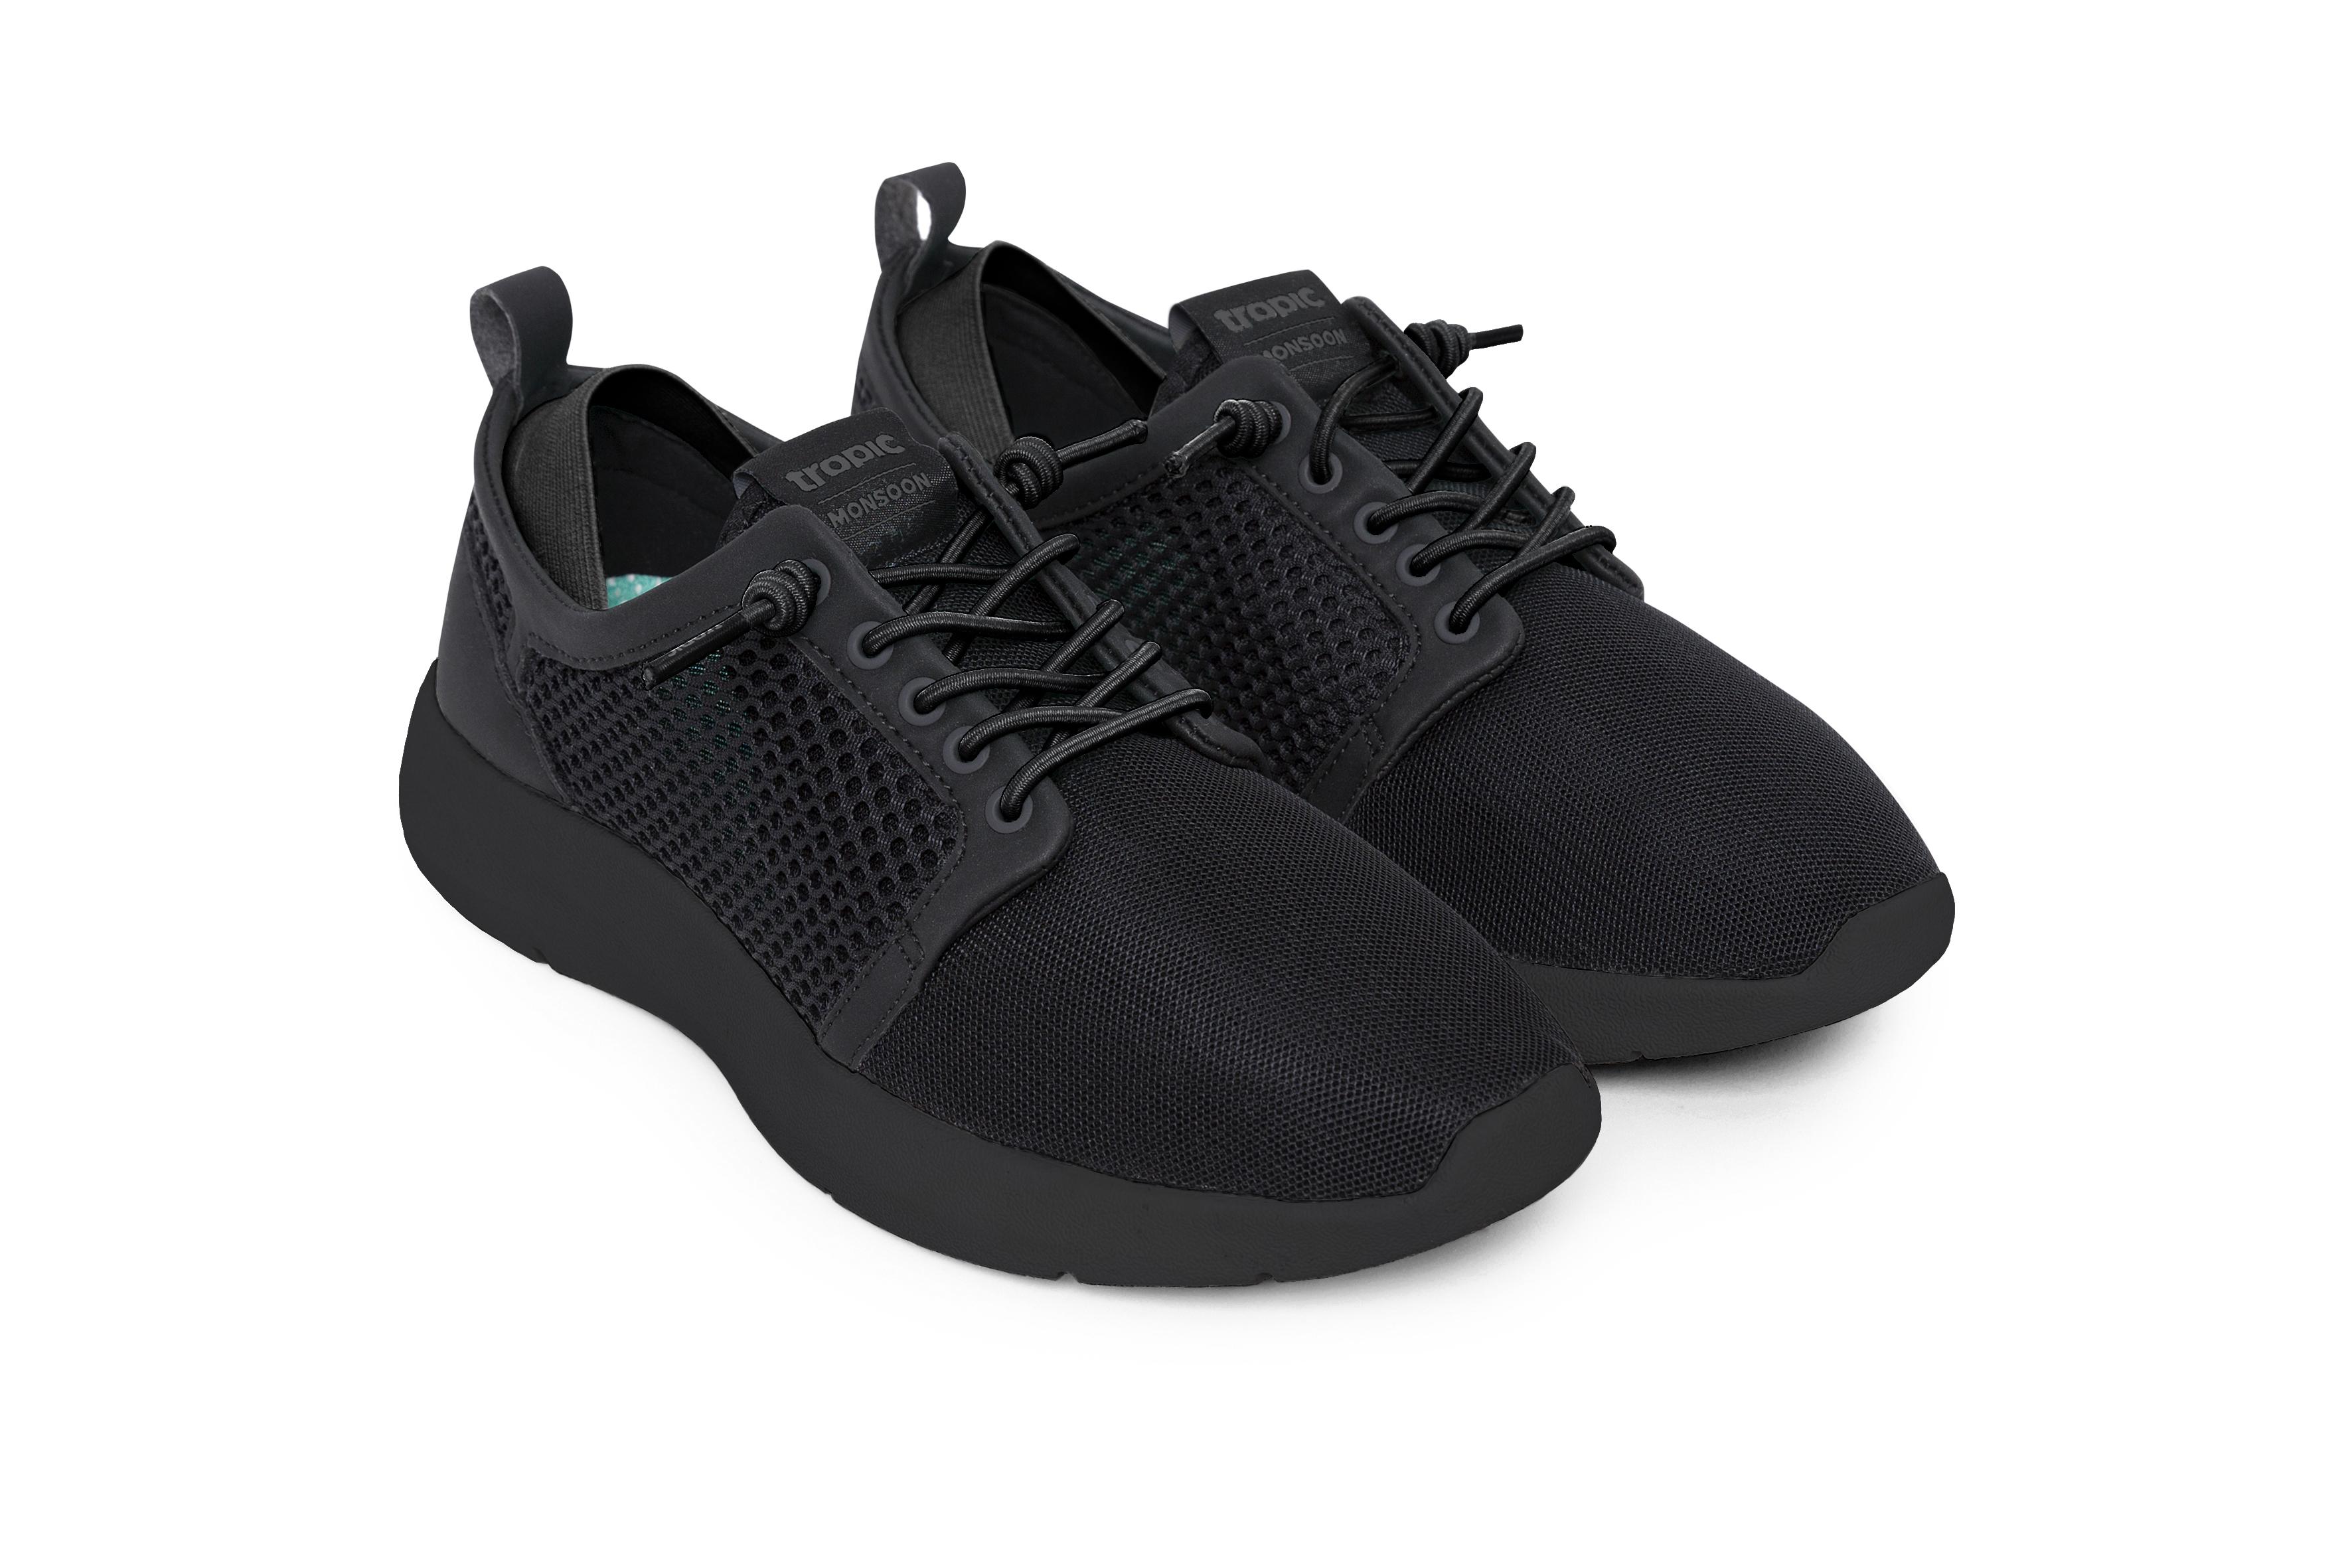 ae120e6df1a458 Tropicfeel | The Ultimate Travel Shoe